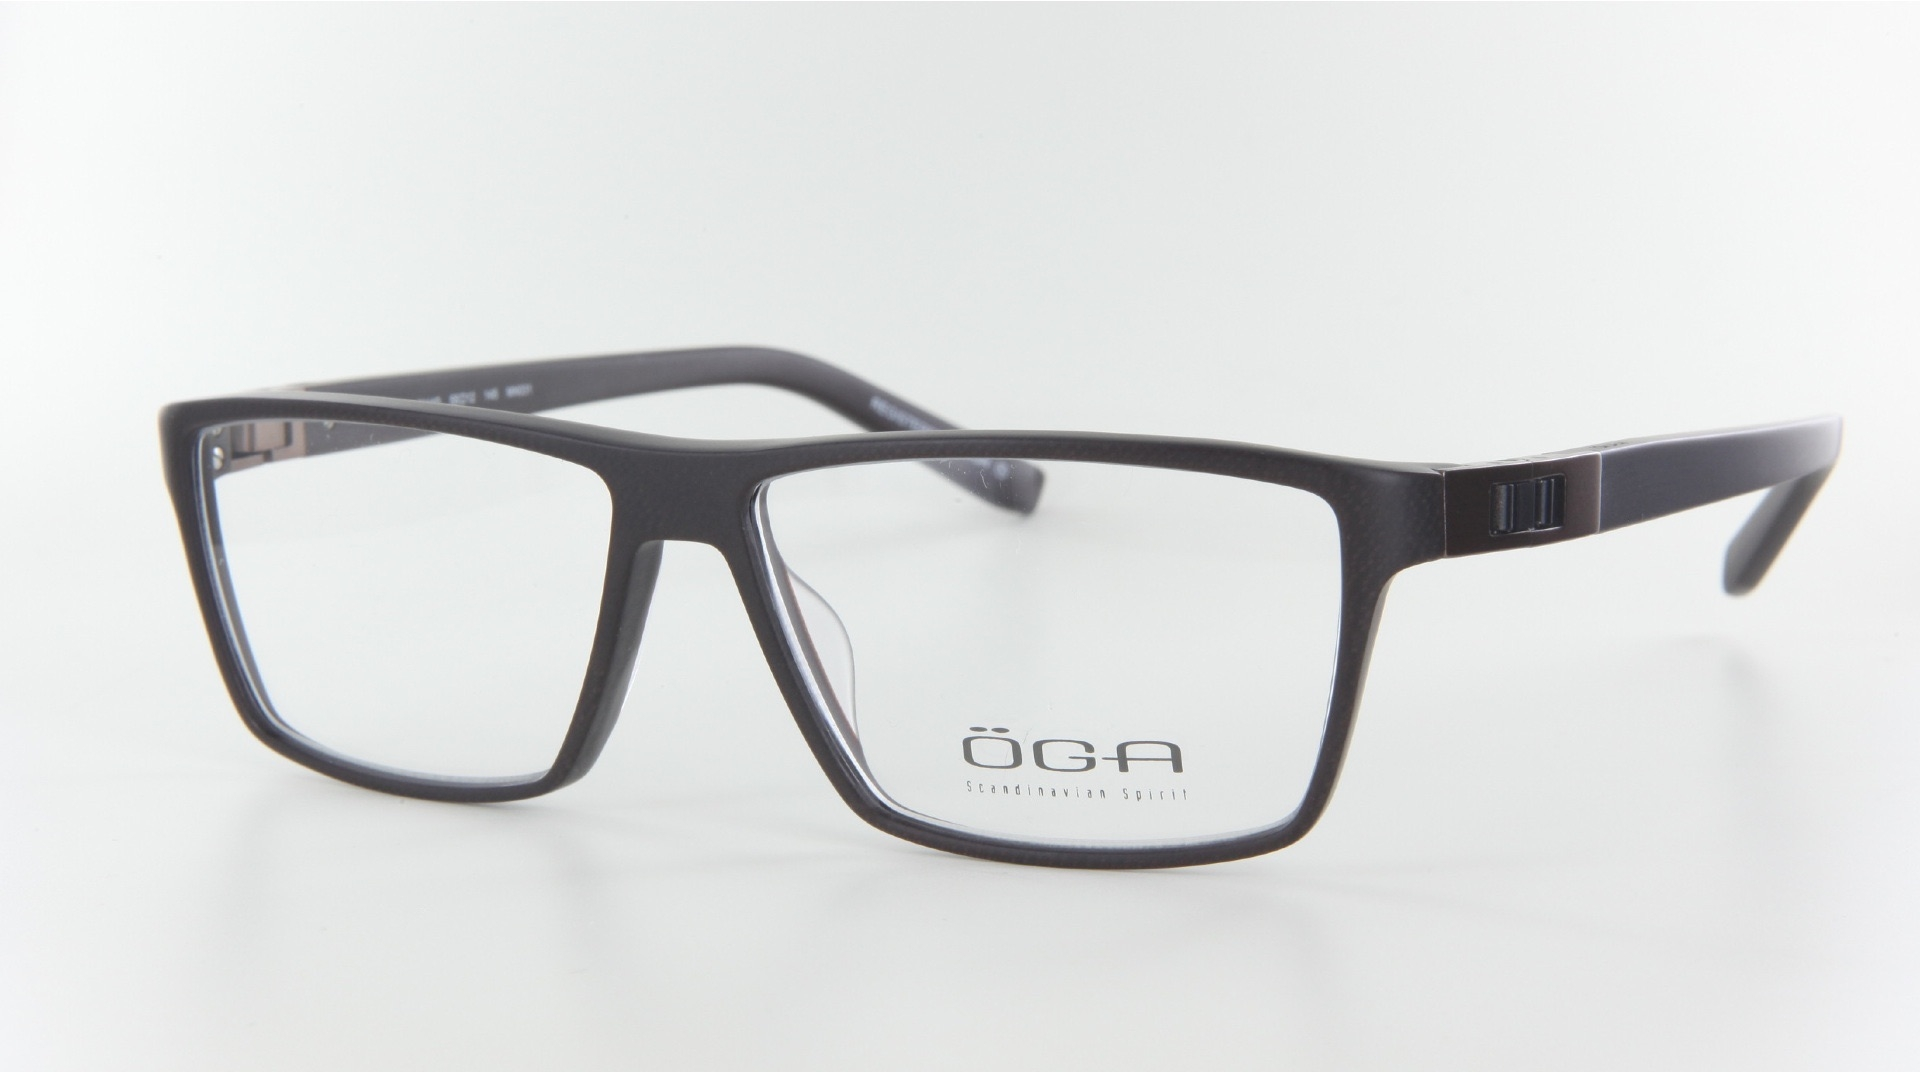 OGA - ref: 70572